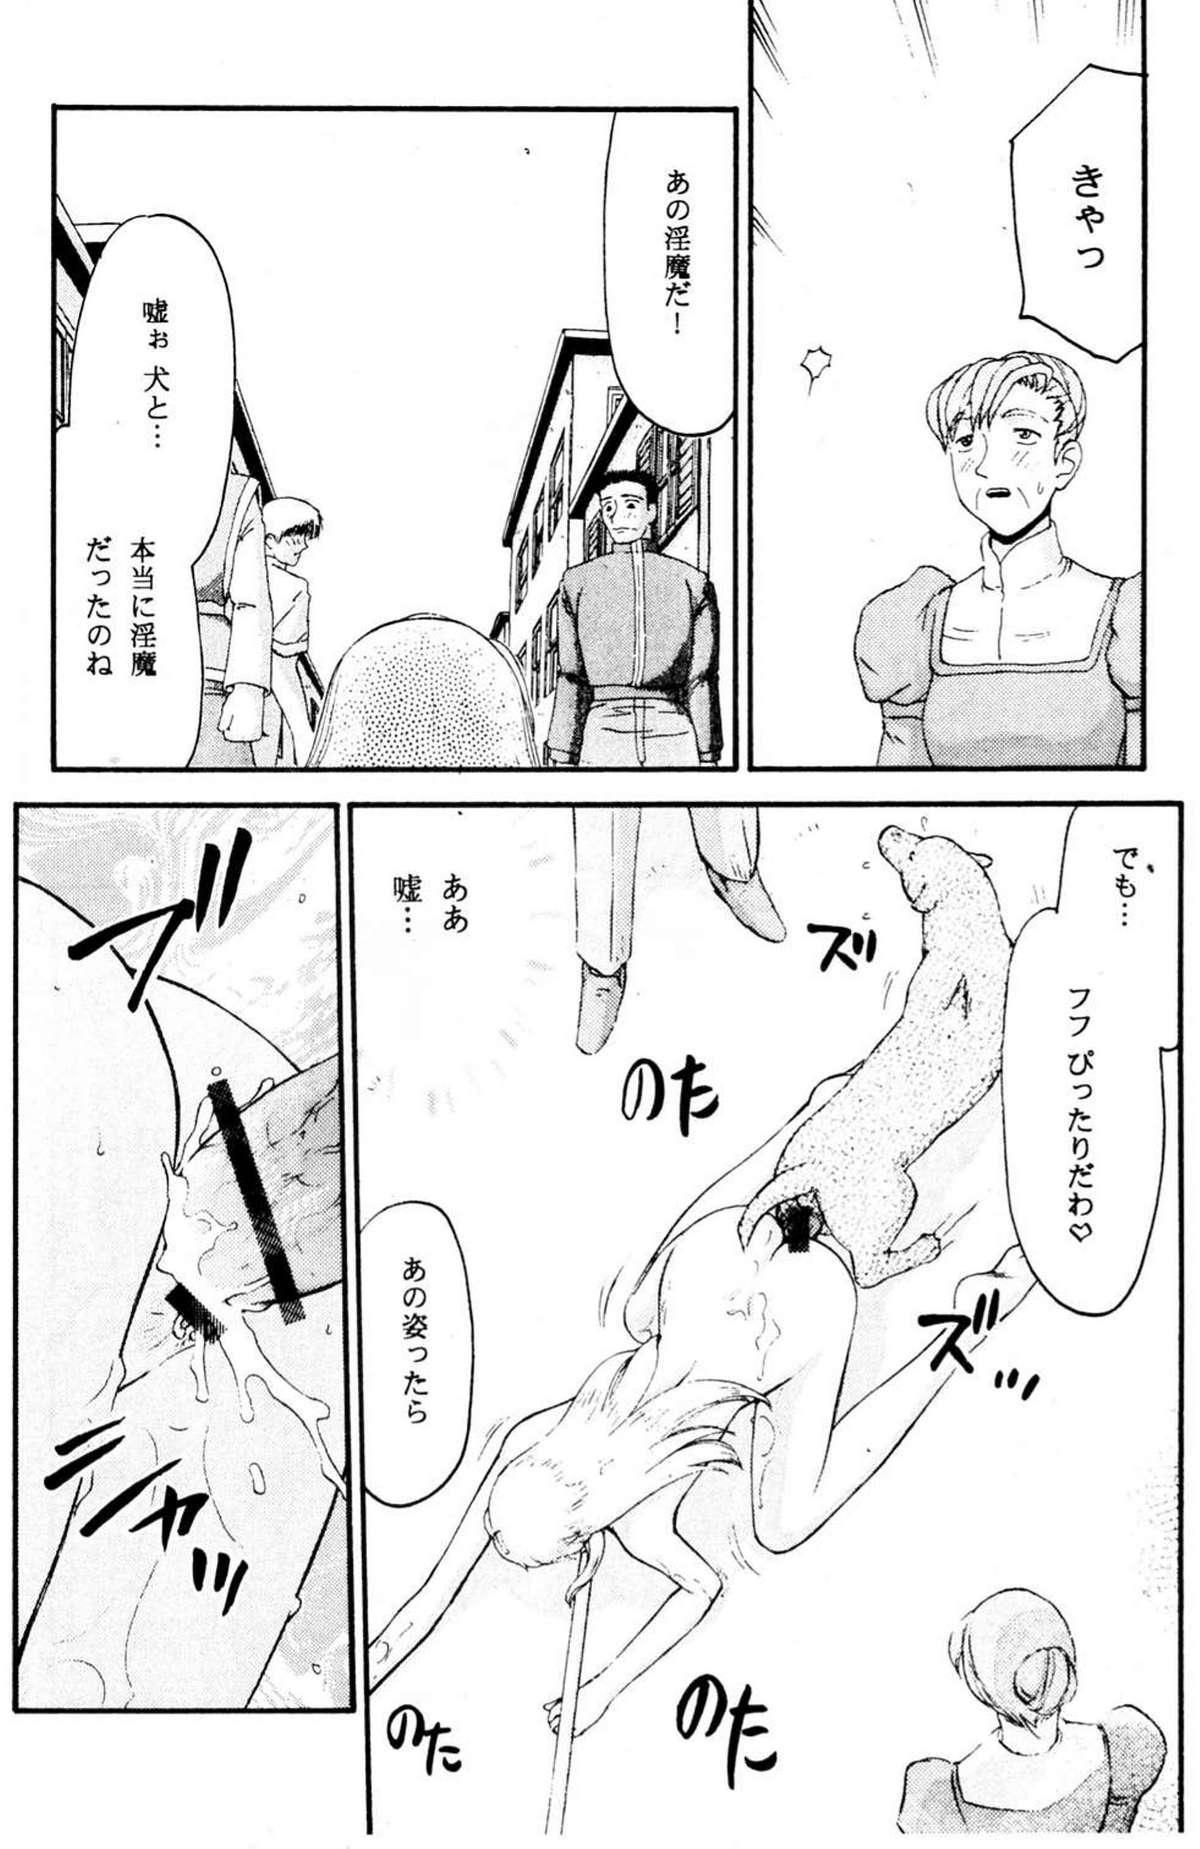 Nise Dragon Blood! 13 1/2 6